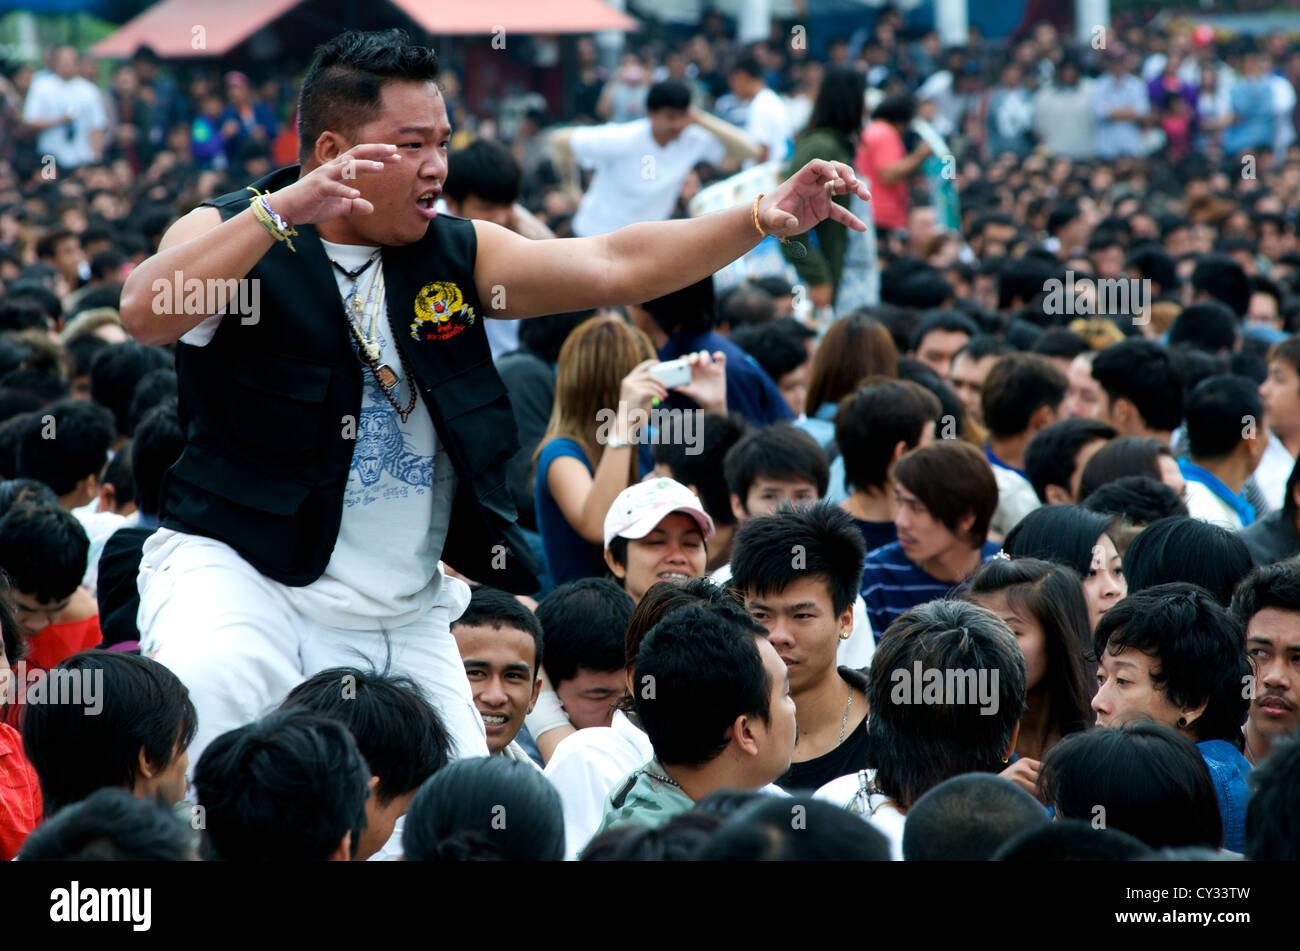 Thai Man from audience in Trance, Wai Khru Tattoo Festival, Wat Bang Phra, Nakhon Pathom Province, Thailand. credit: - Stock Image